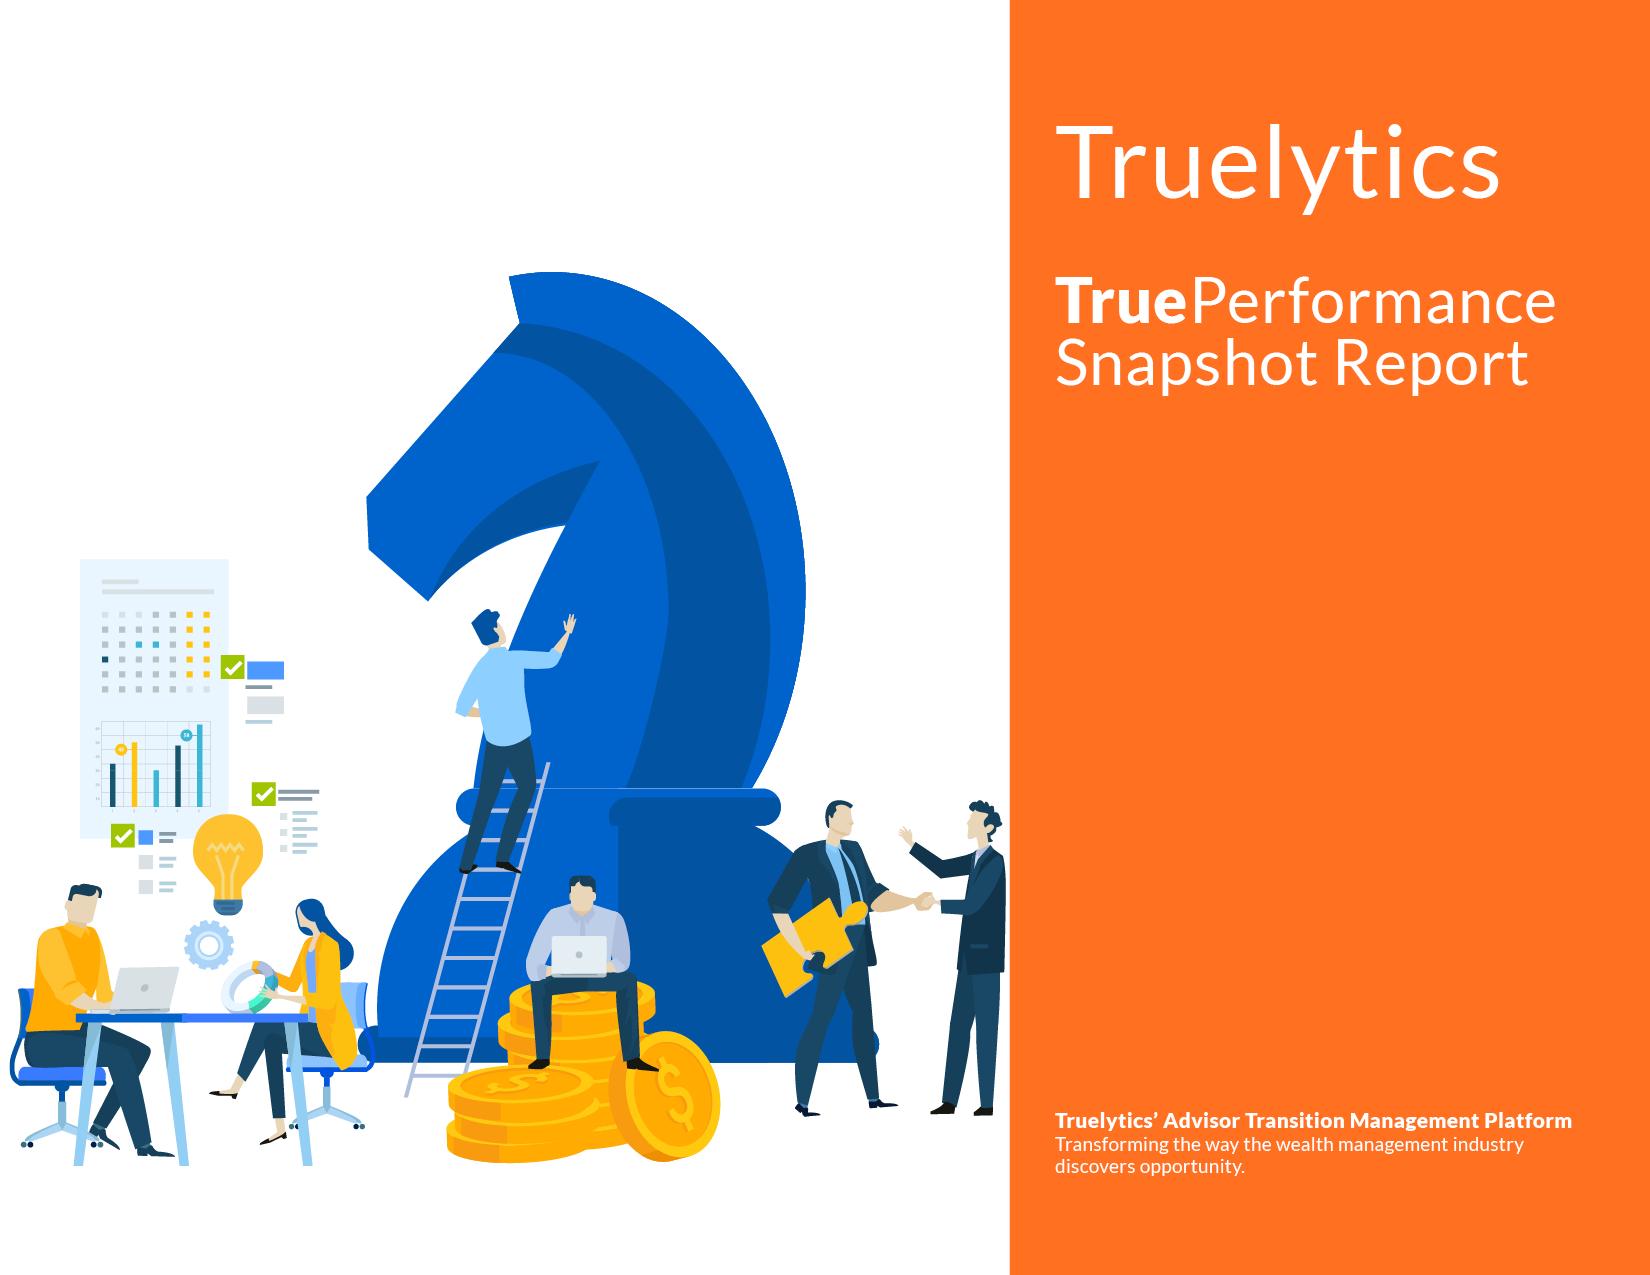 Truelytics-Snapshot-Report-V2b